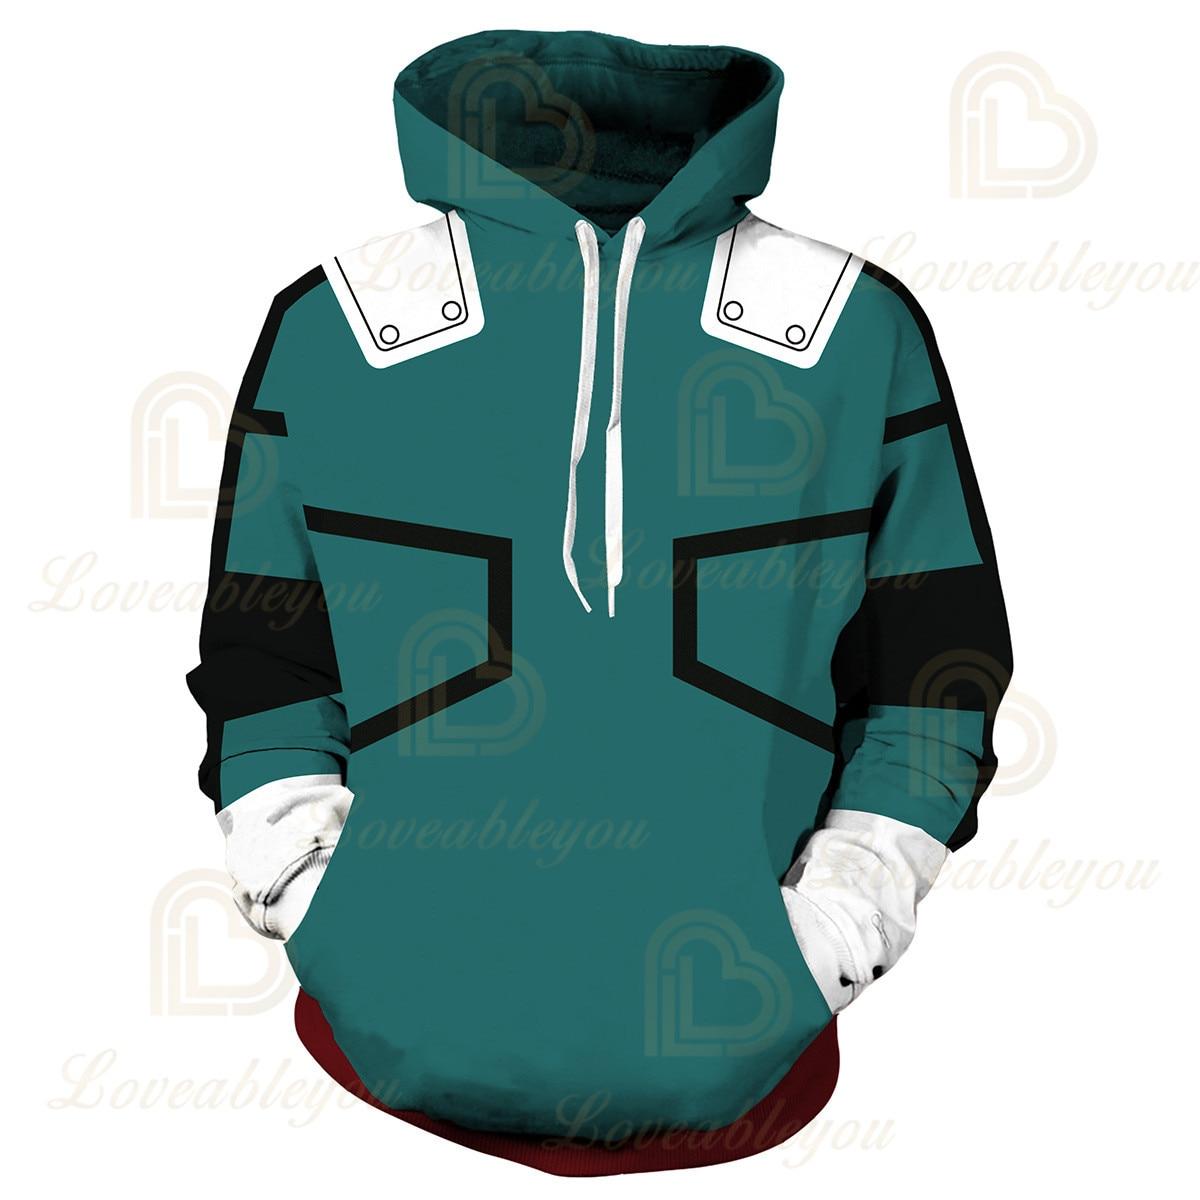 Anime Hoodies Sweatshirts Boku No My Hero Academia Cosplay Costumes Bakugou Todoroki Shoto Spring/Autumn Coat 12